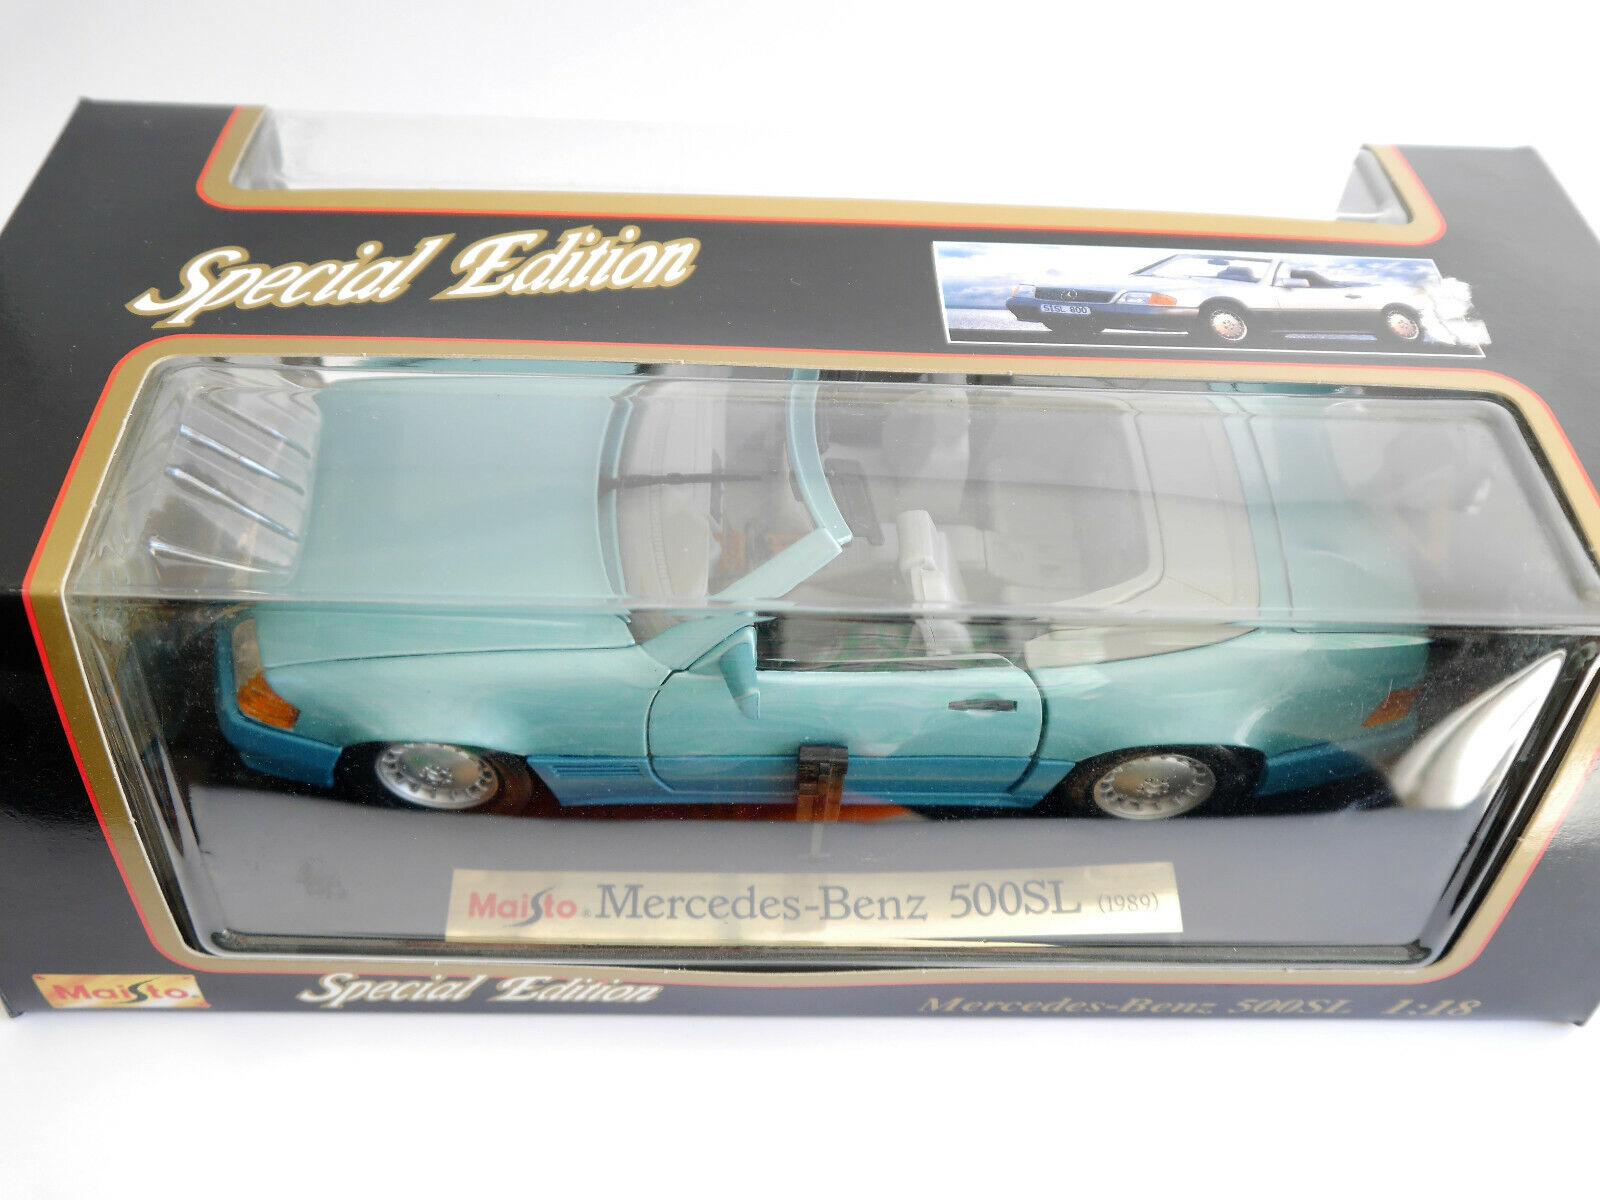 Mercedes R 129 500 sl en berilo metalizado turquesa Turquoise, maisto en 1 18 Boxed